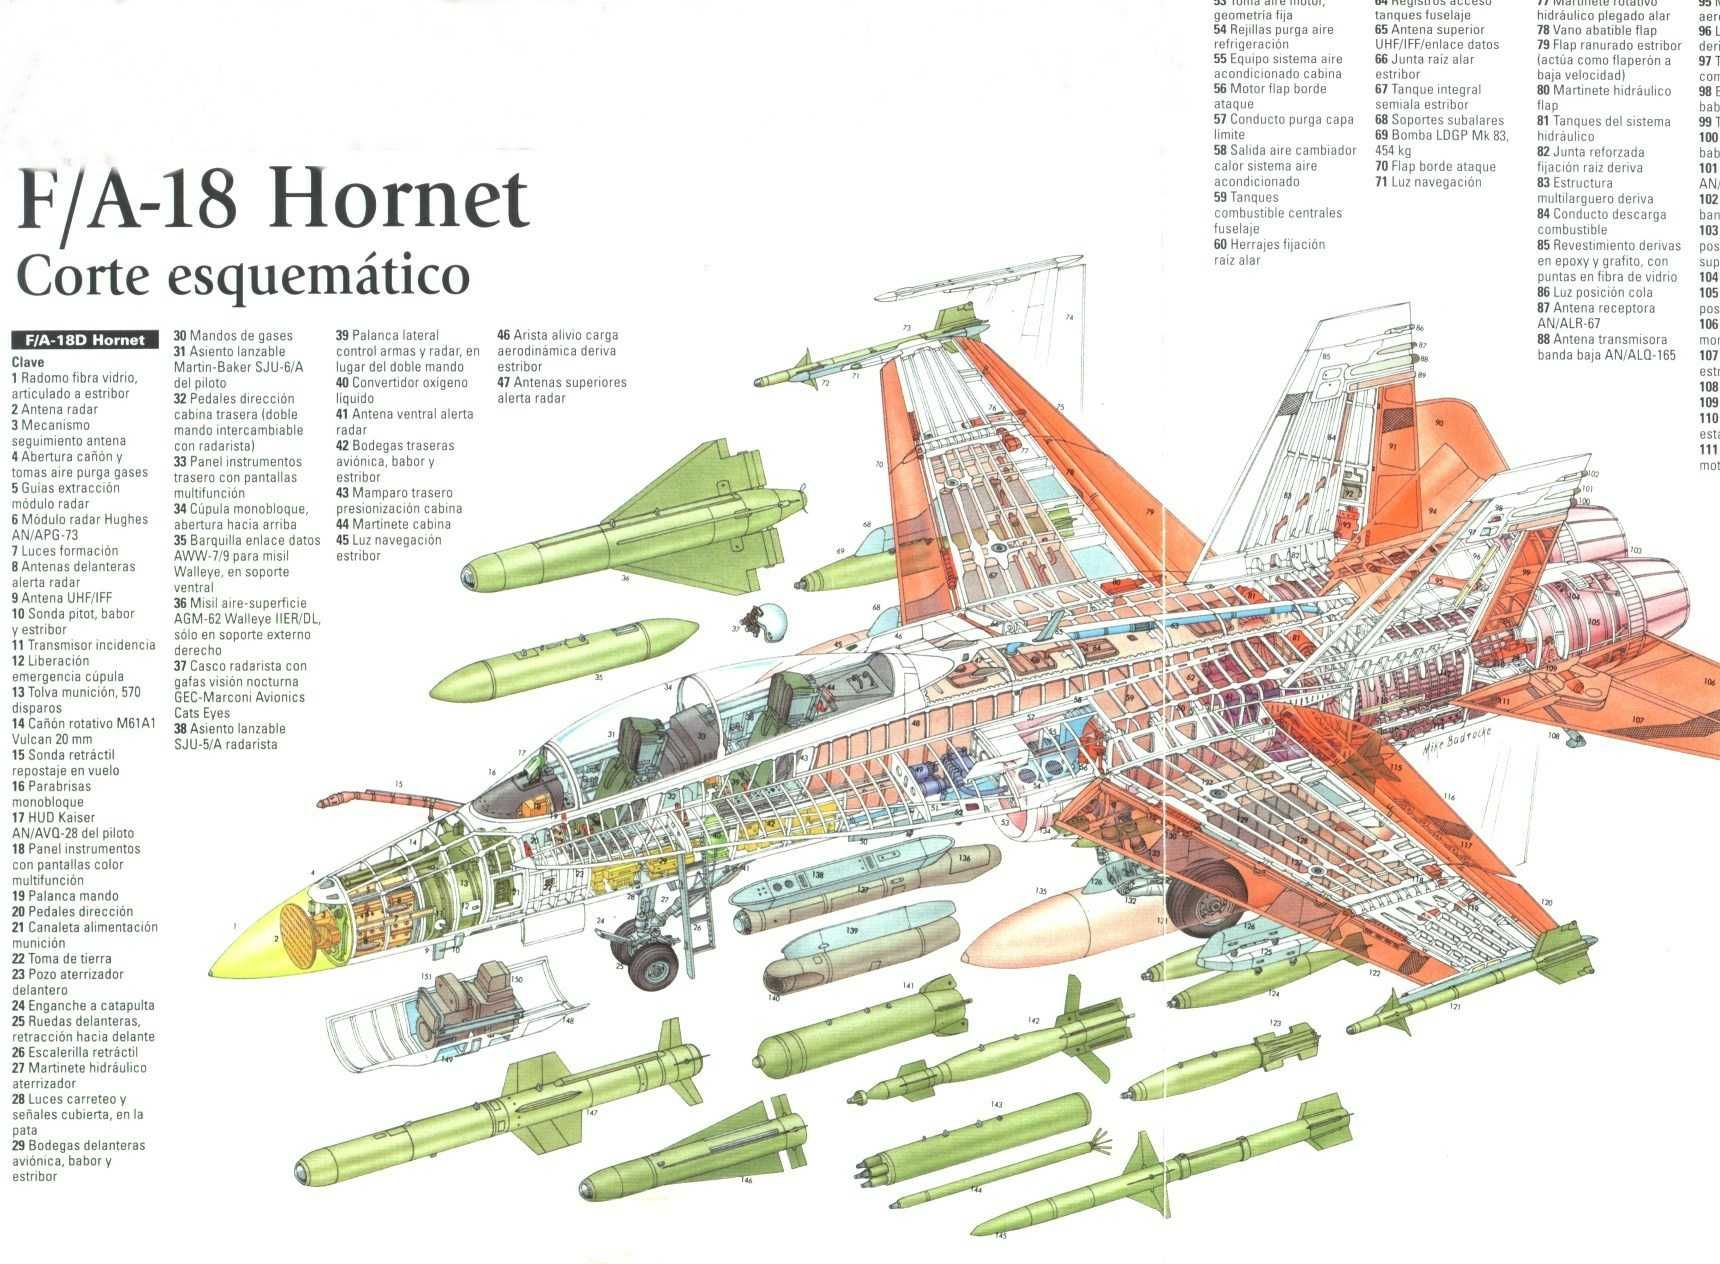 hornet [ 1720 x 1264 Pixel ]